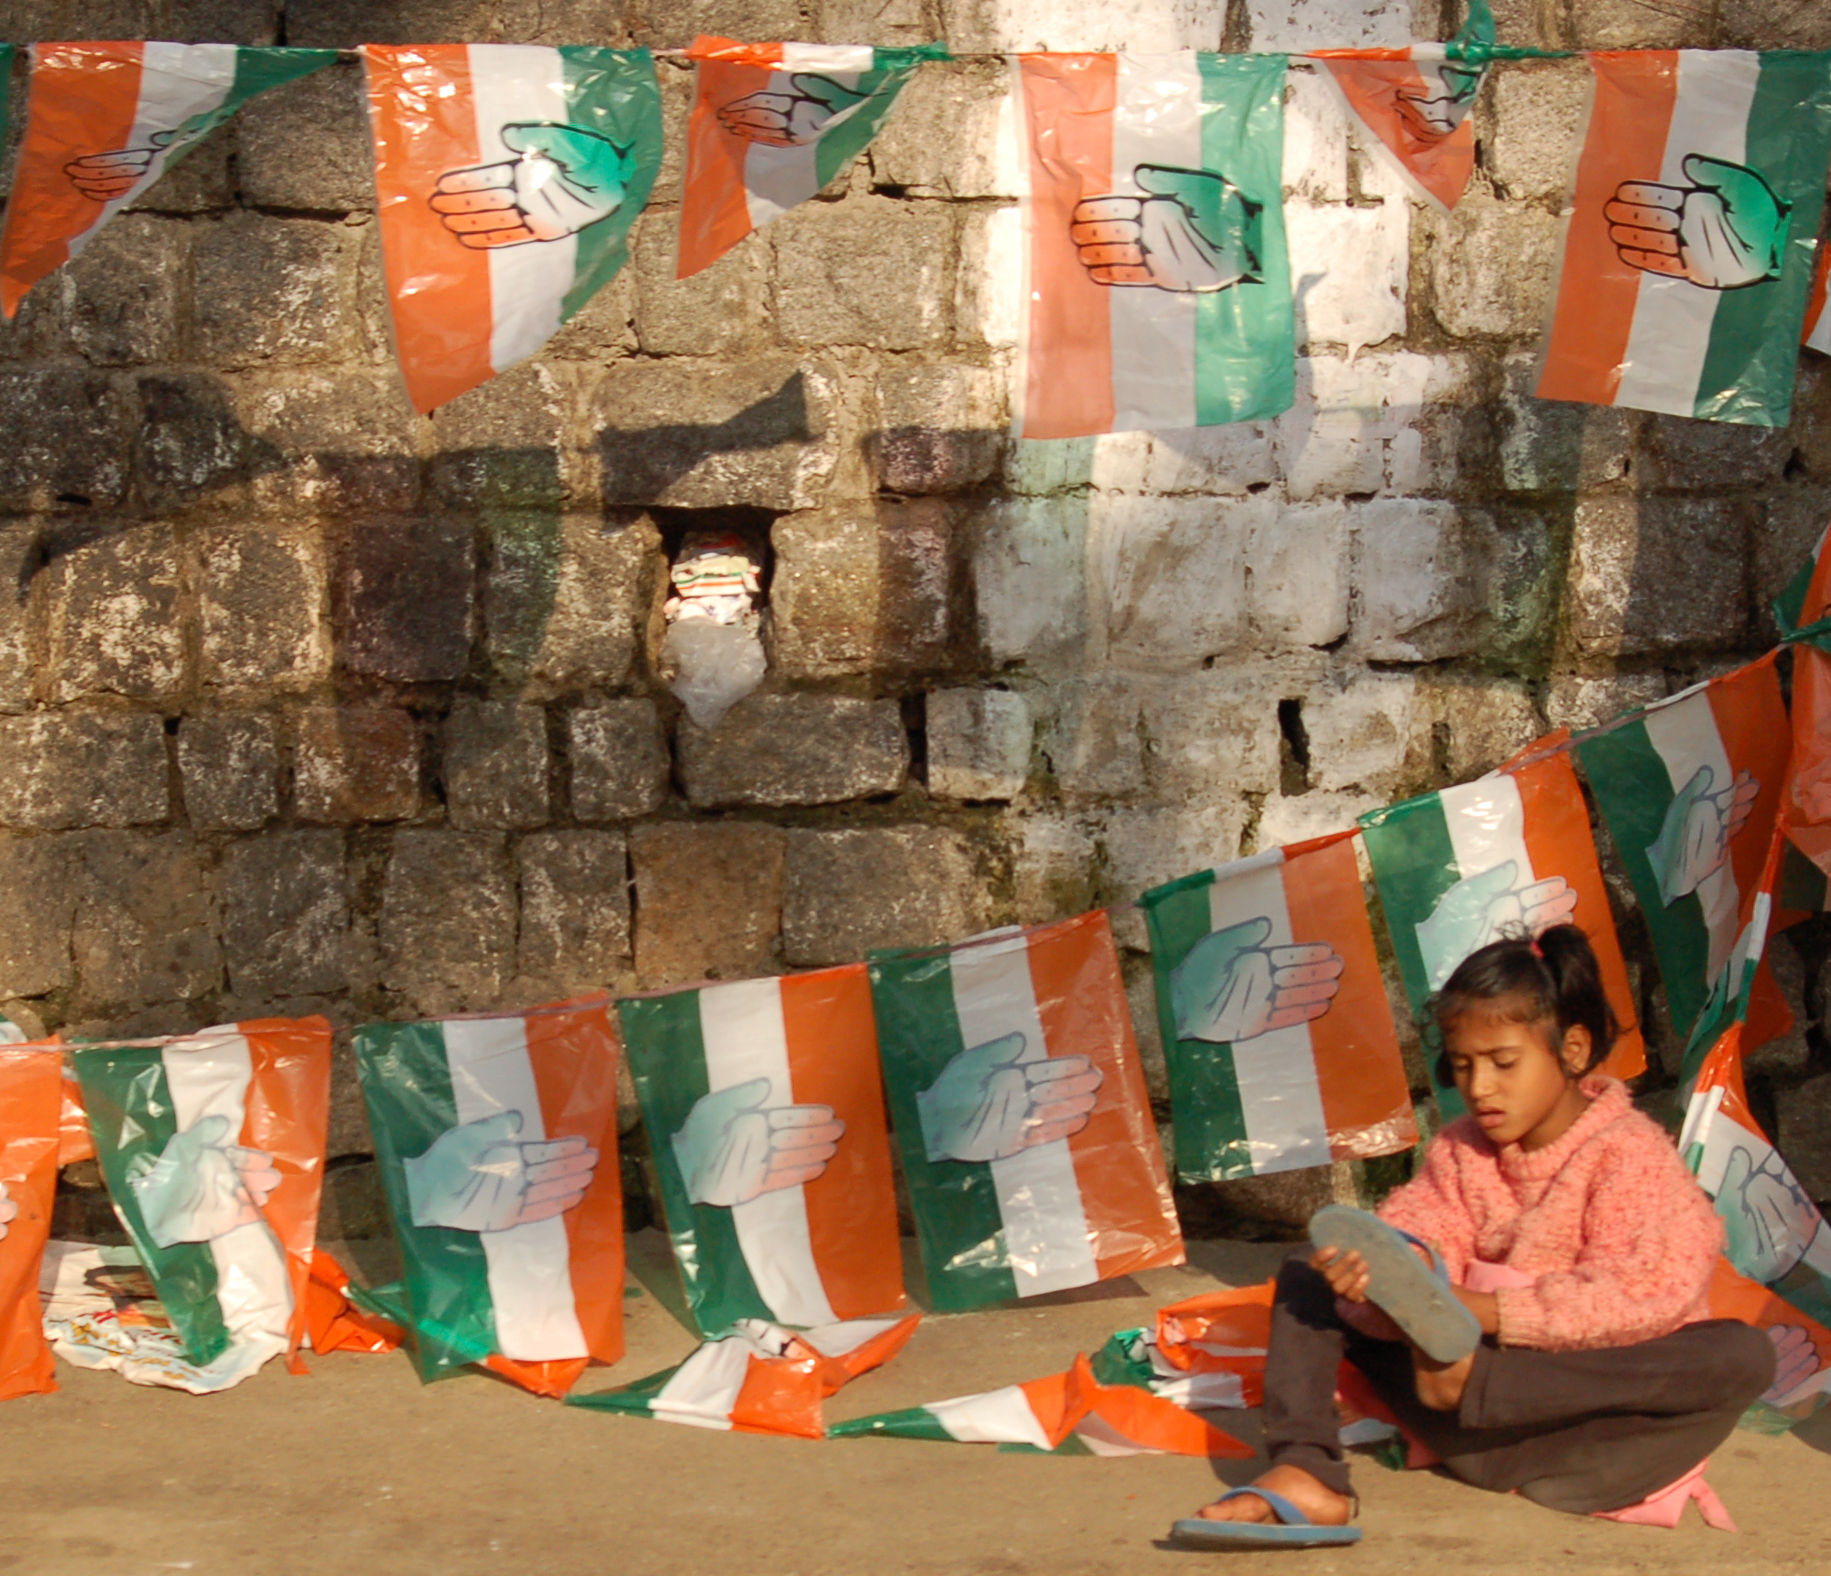 DSC_0095 from India.jpg